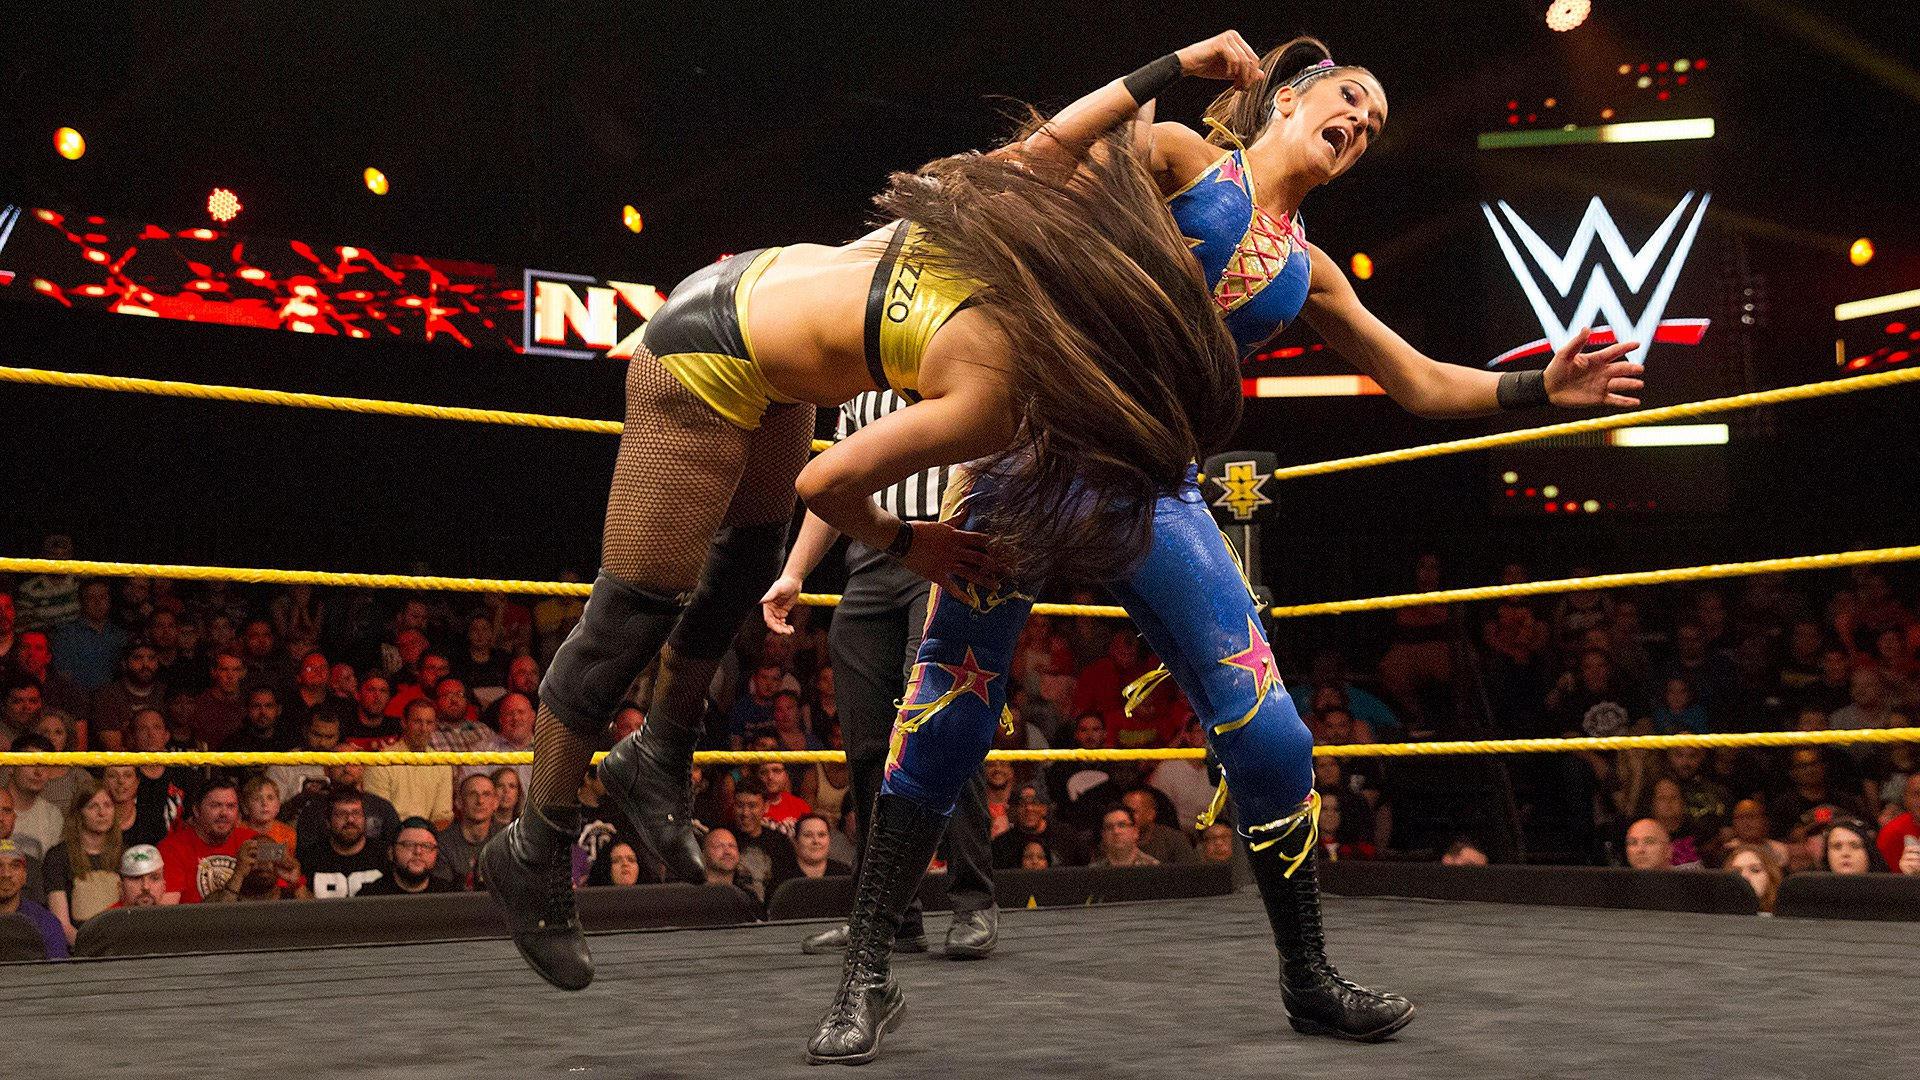 Resultats WWE NXT 22 juin